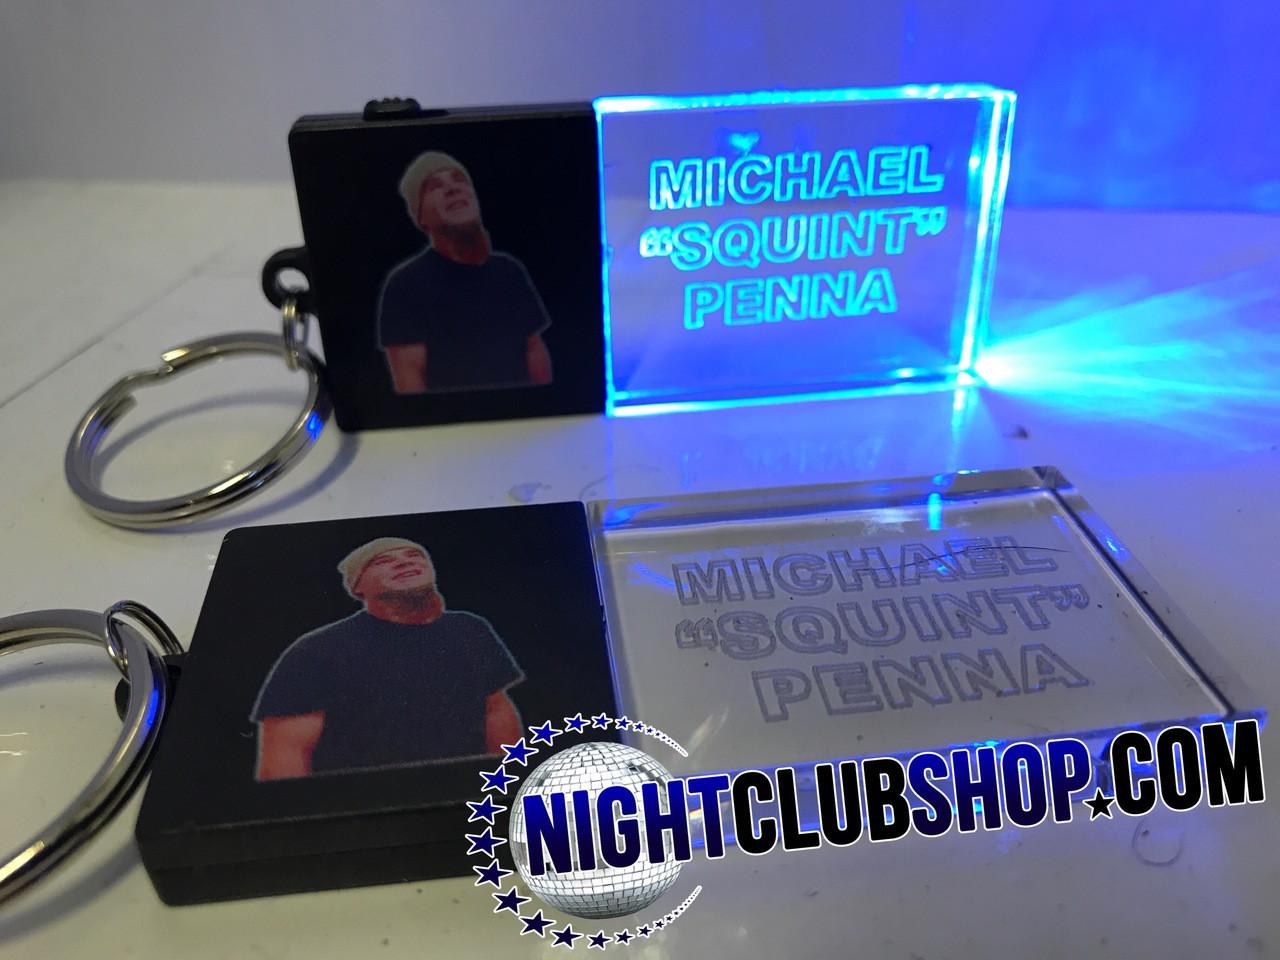 Beam,LED,Keychain,Key,chain,LED keychain, custom, BEAM, dual, print,engraved, logo,text, laser engraved,personalized,promo,merch,fundraiser,nightclub,fund raiser,RIP Squint